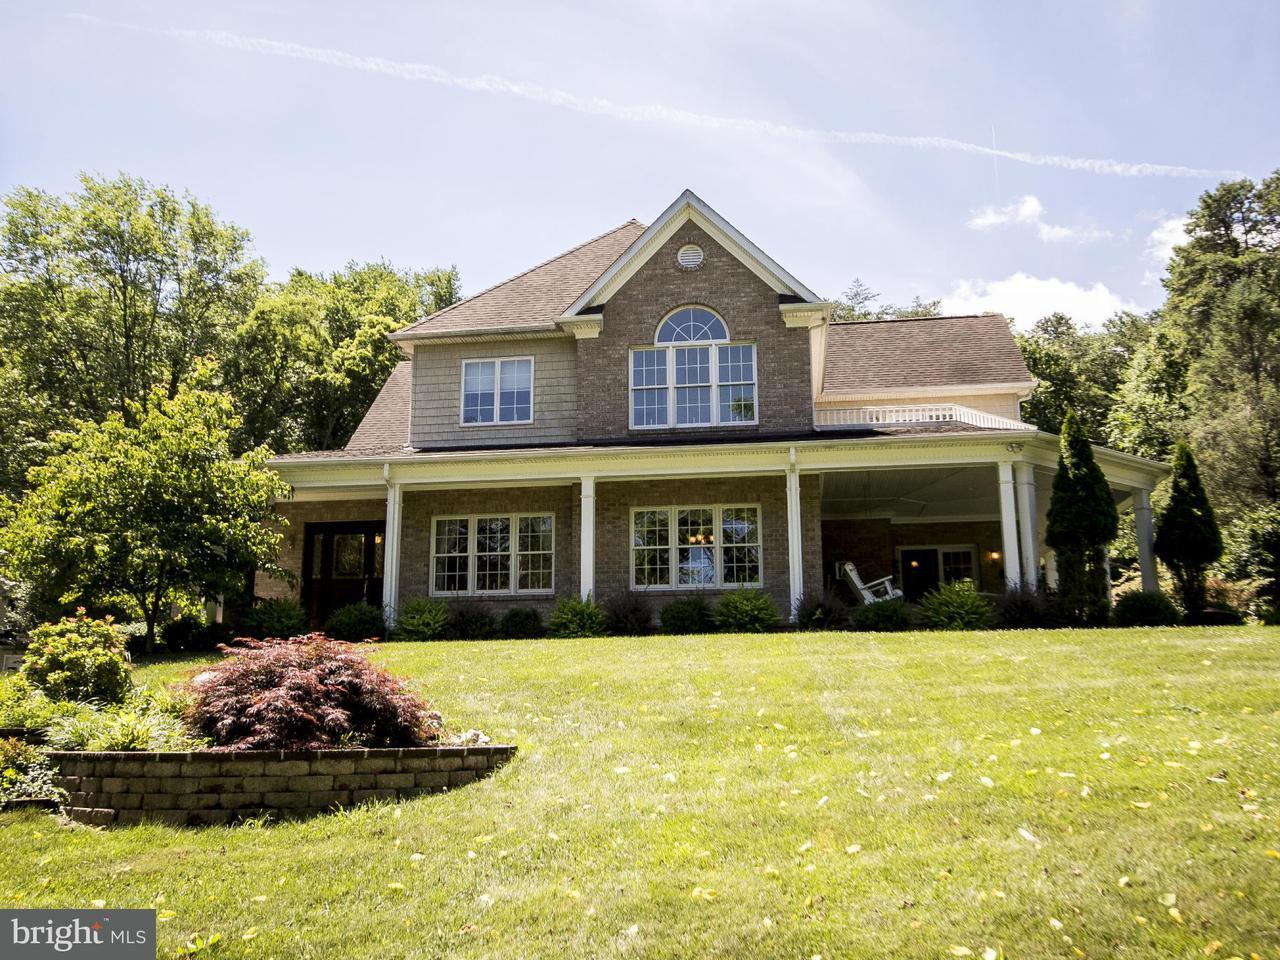 獨棟家庭住宅 為 出售 在 15113 JARRETTSVILLE PIKE 15113 JARRETTSVILLE PIKE Monkton, 馬里蘭州 21111 美國